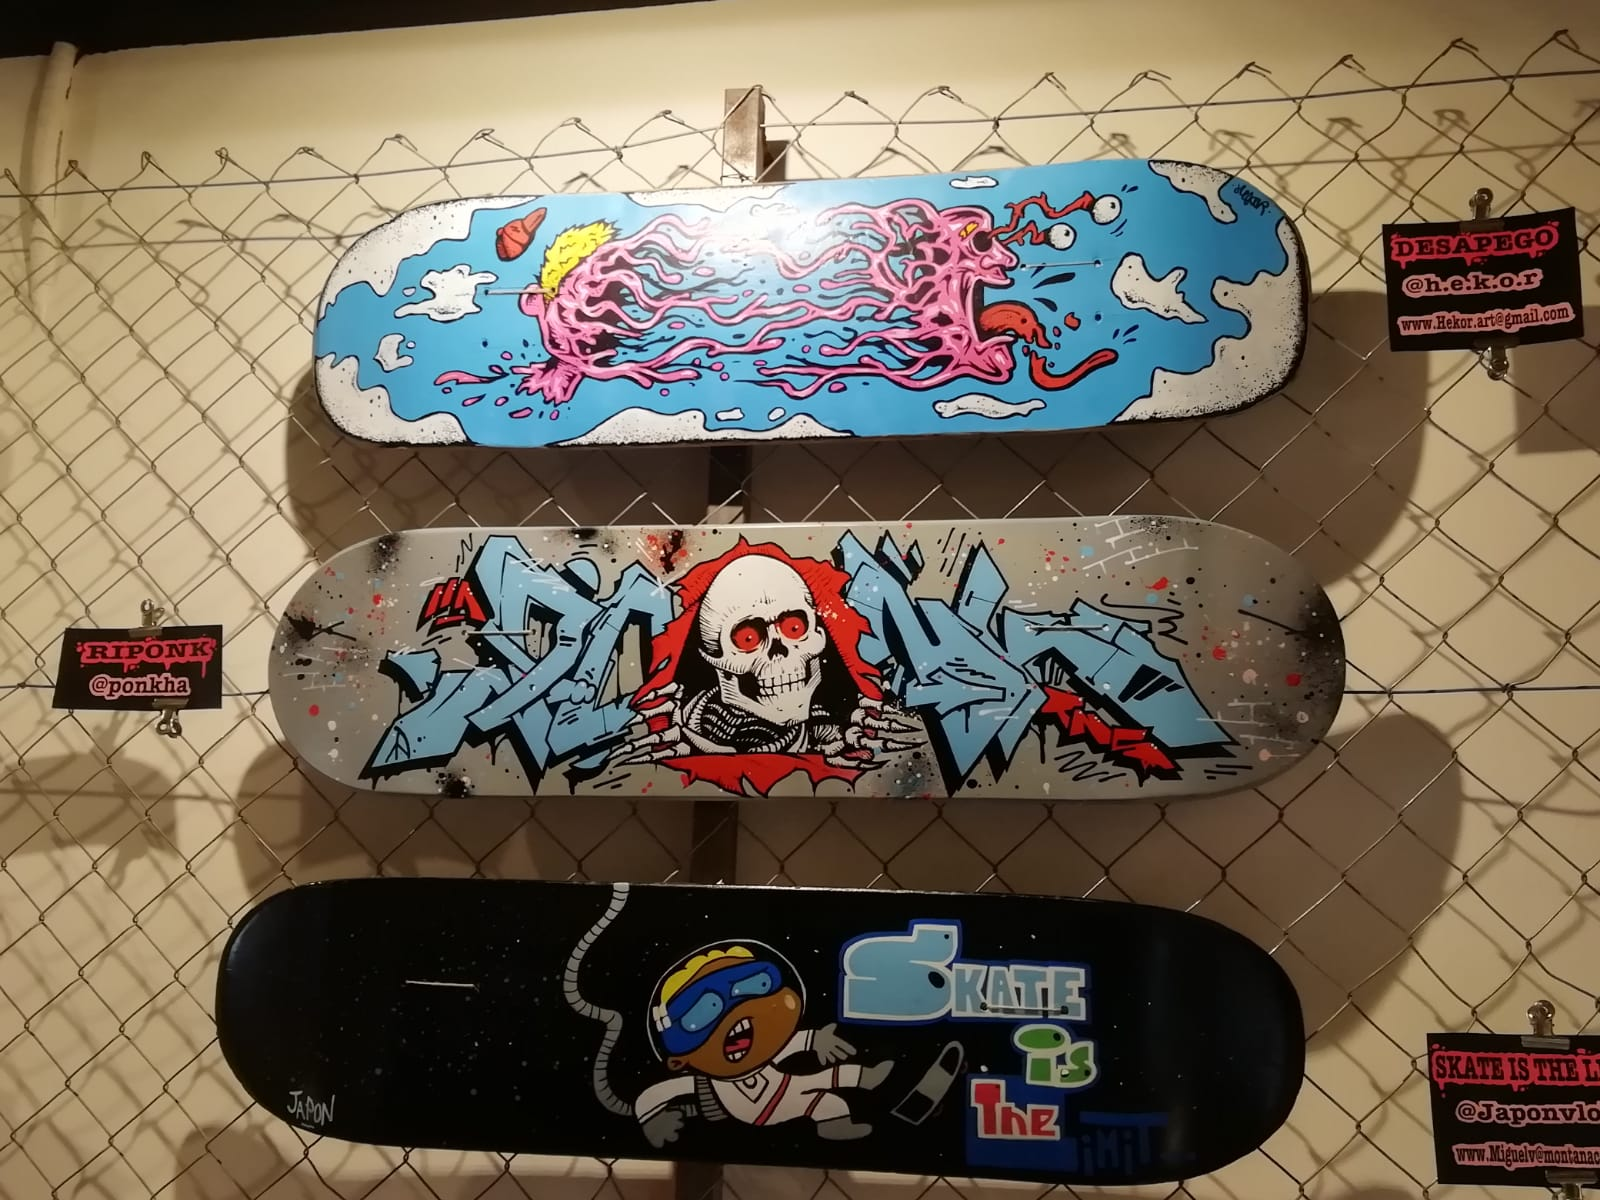 arte urbano expo skate Barcelona